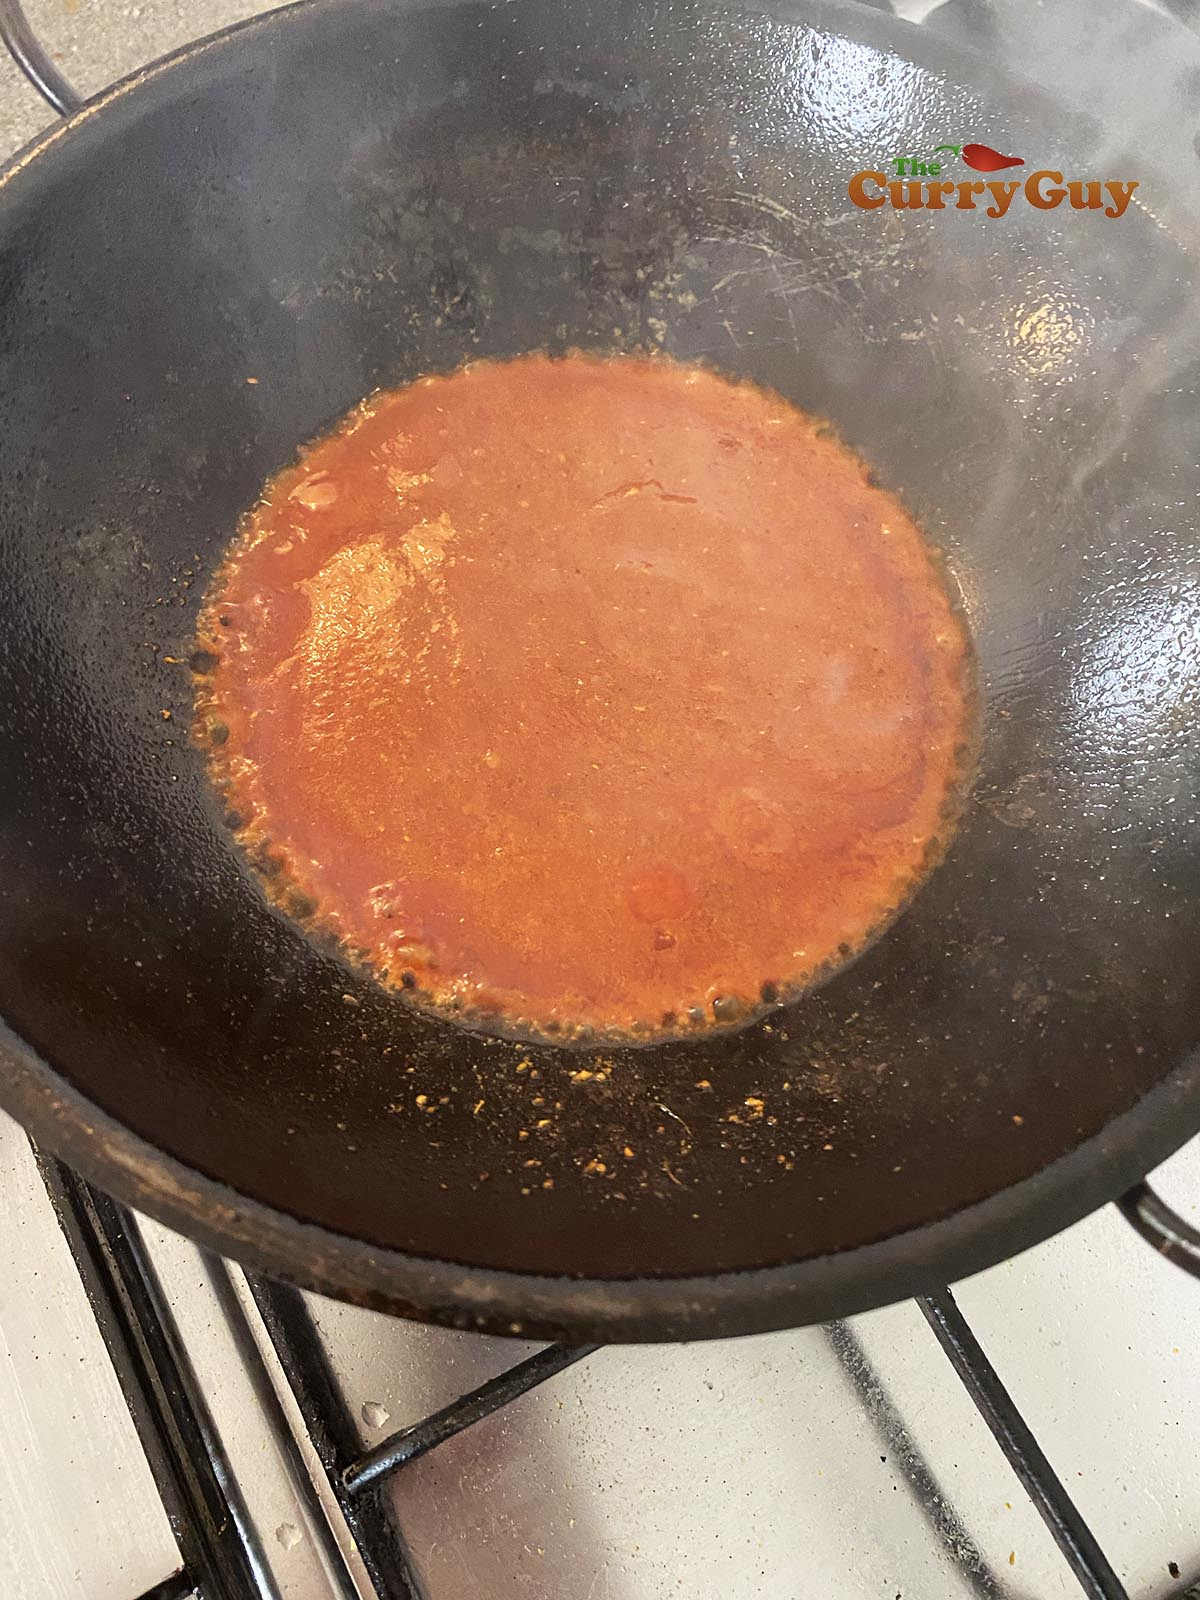 Stirring in the tomato puree